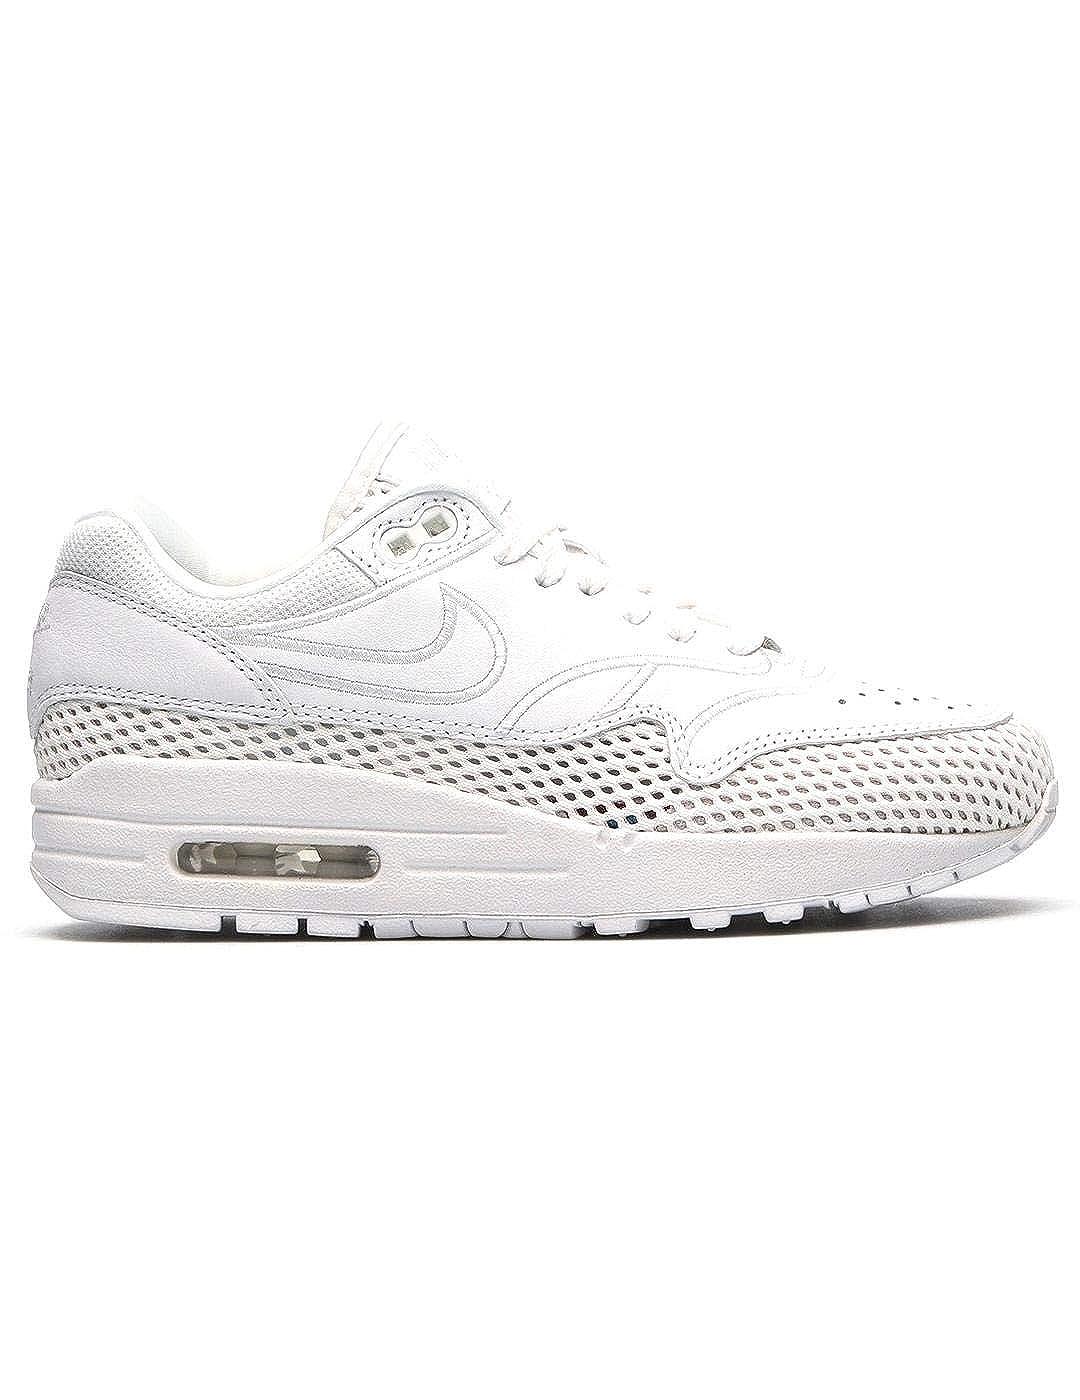 Nike  Damen Turnschuhe Weiß weiß